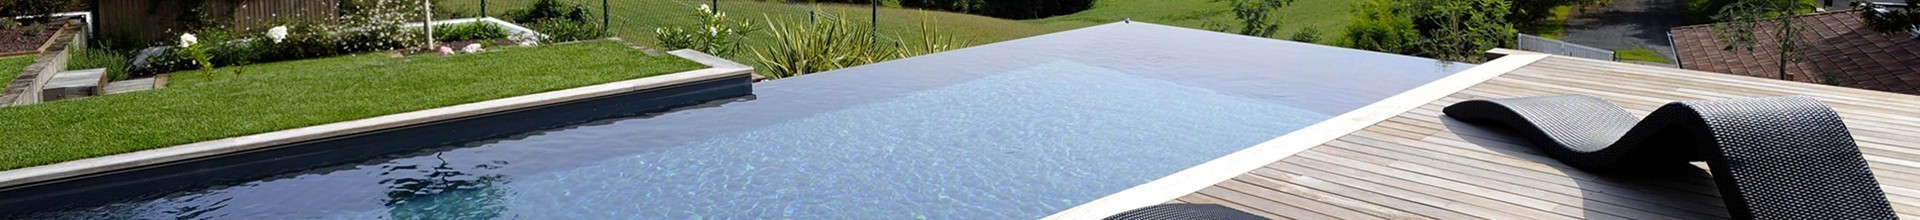 Direct usine, piscine coque prix Oise